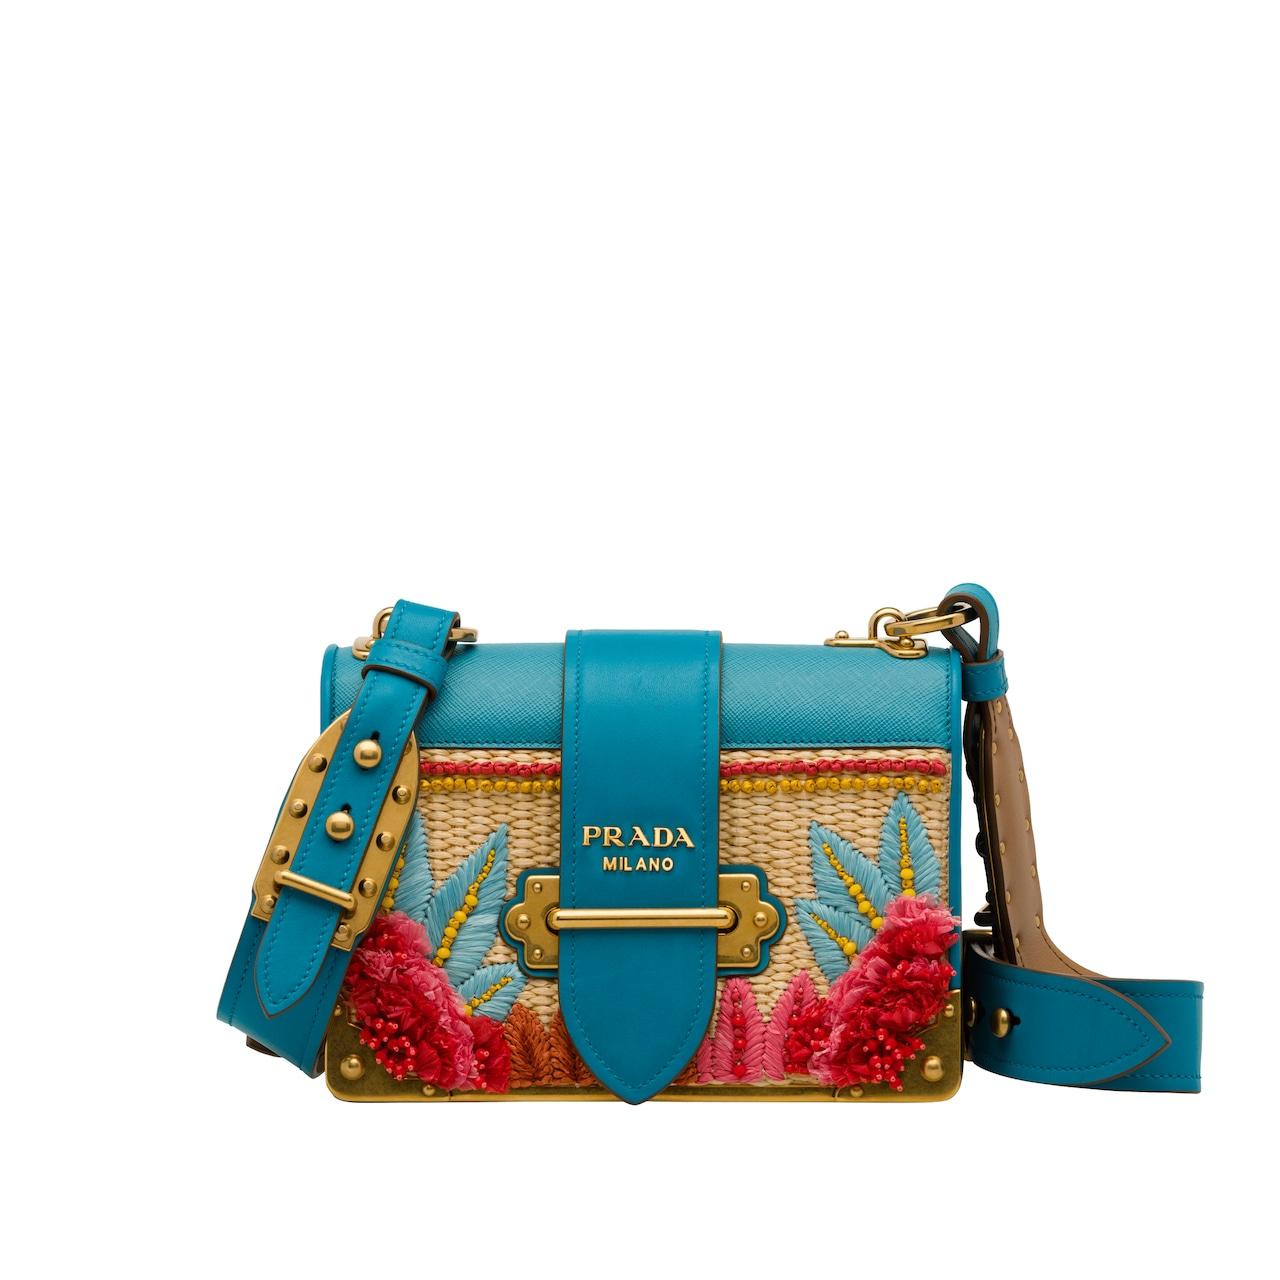 Prada Cahier straw and leather bag